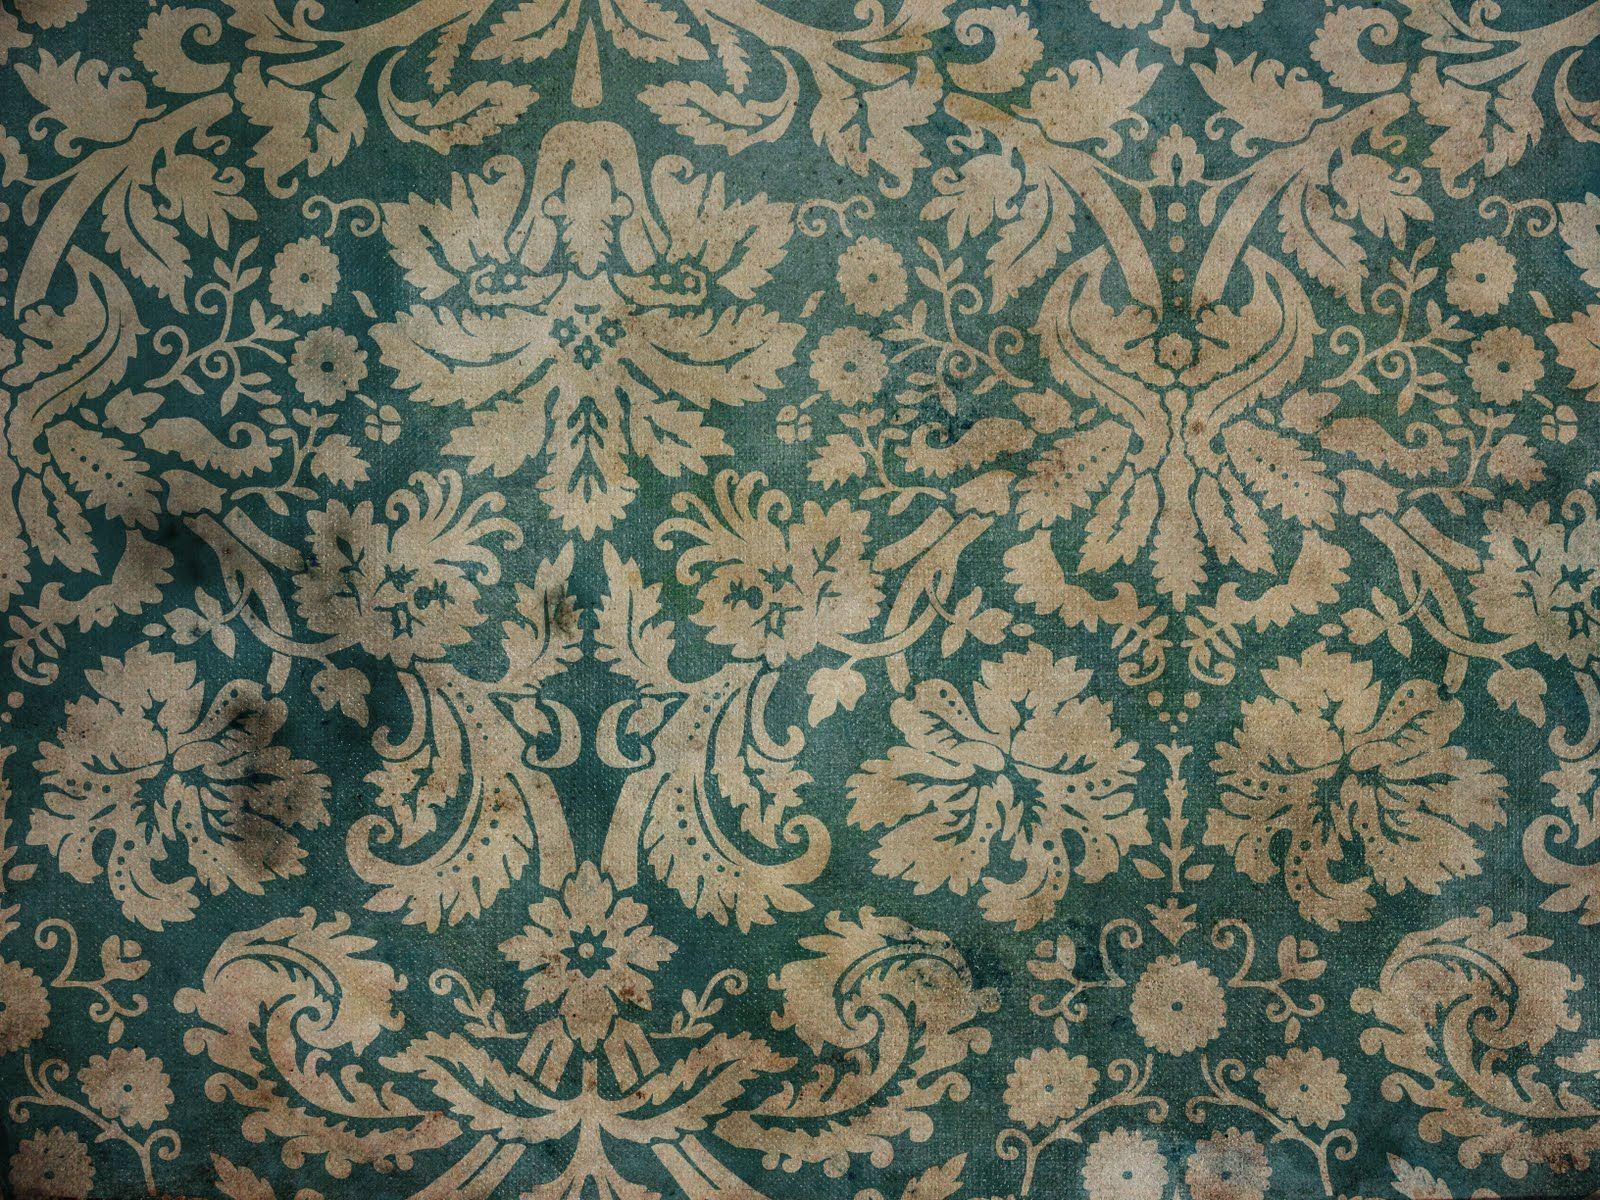 Antique Wallpapers Wallpaper Cave